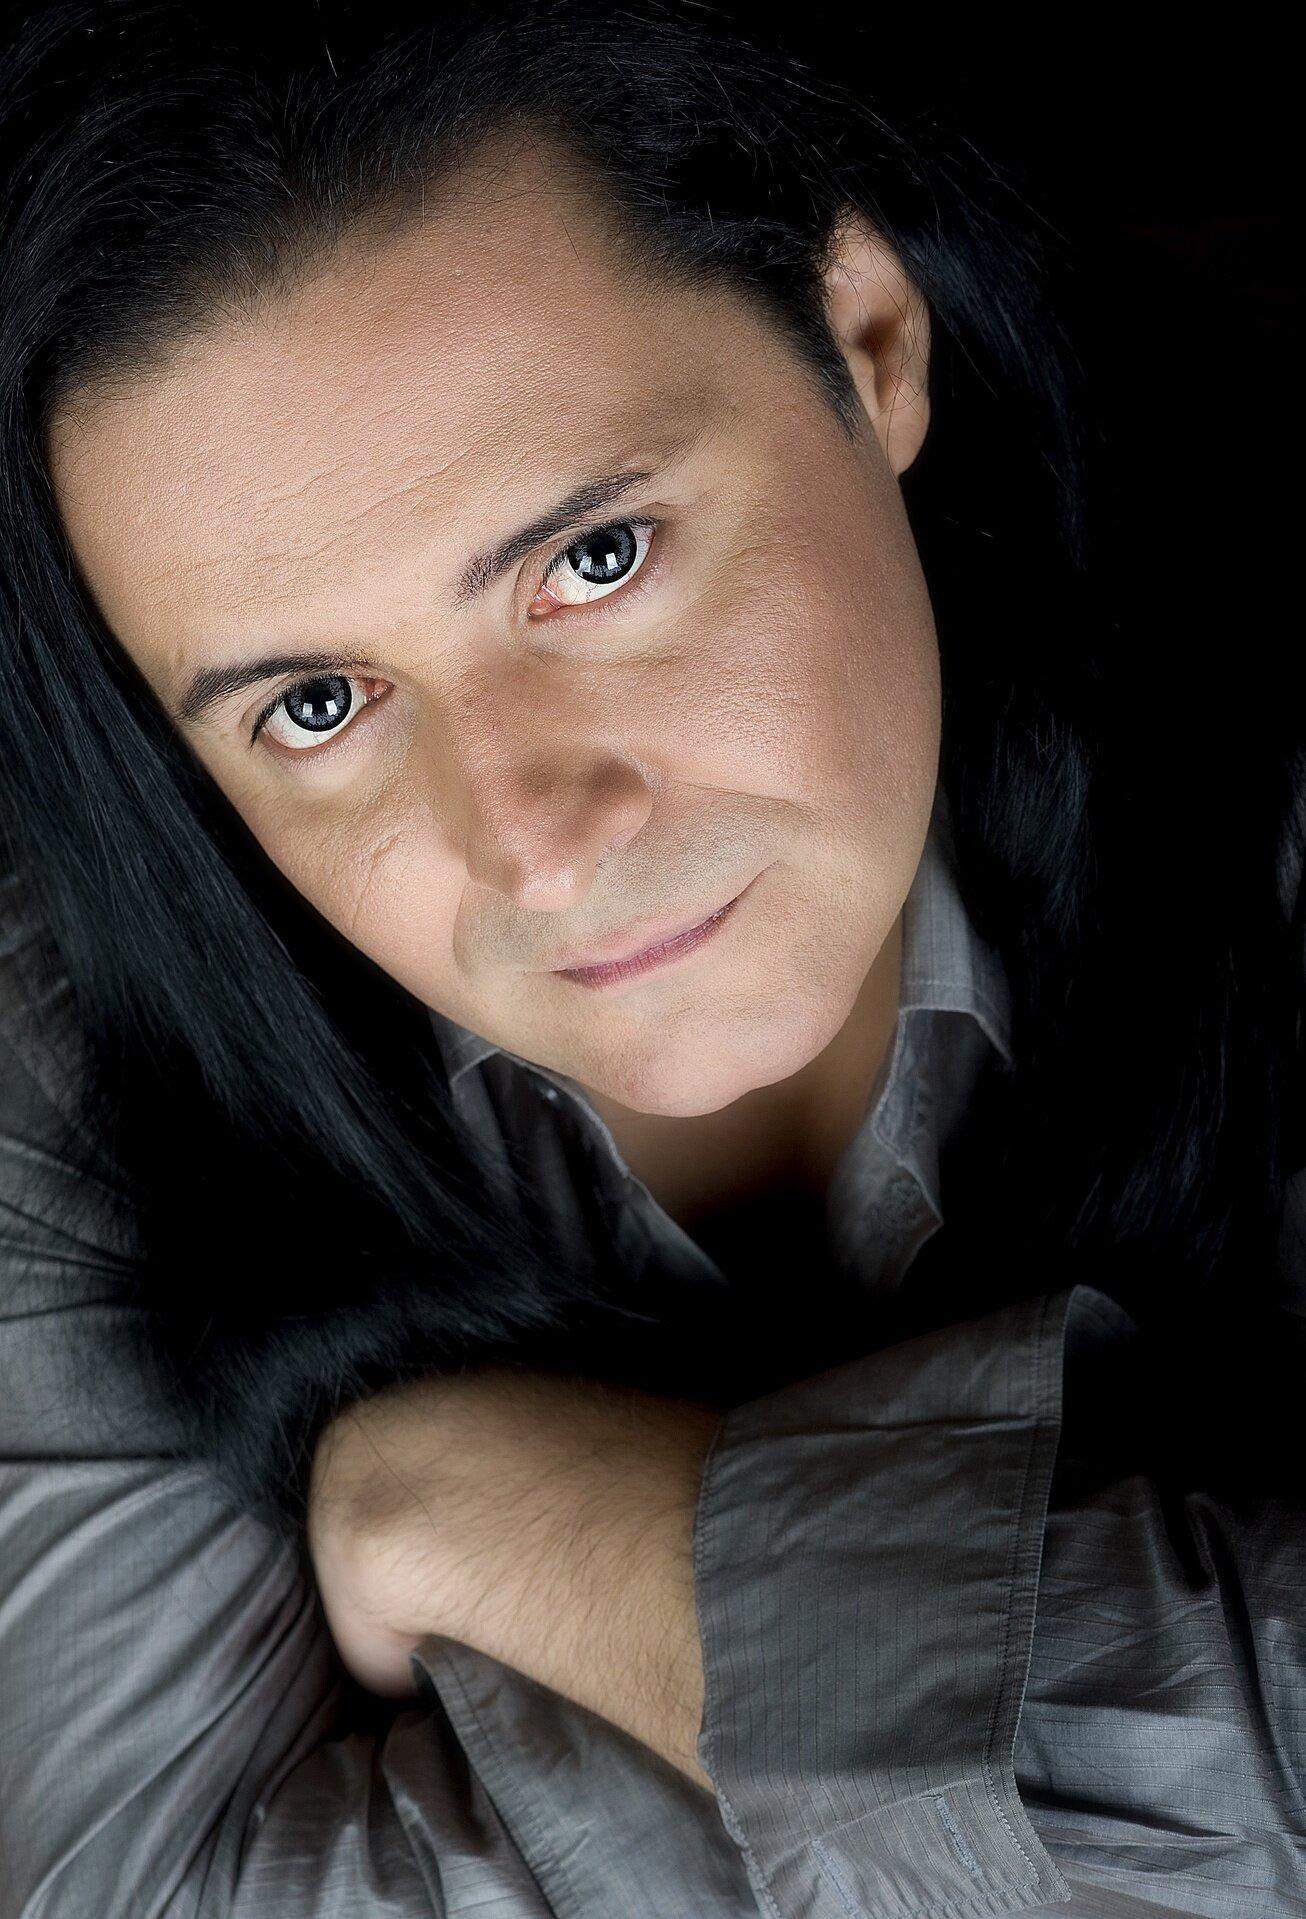 Didier_Castell-Jacomin,_pianist-1.jpg